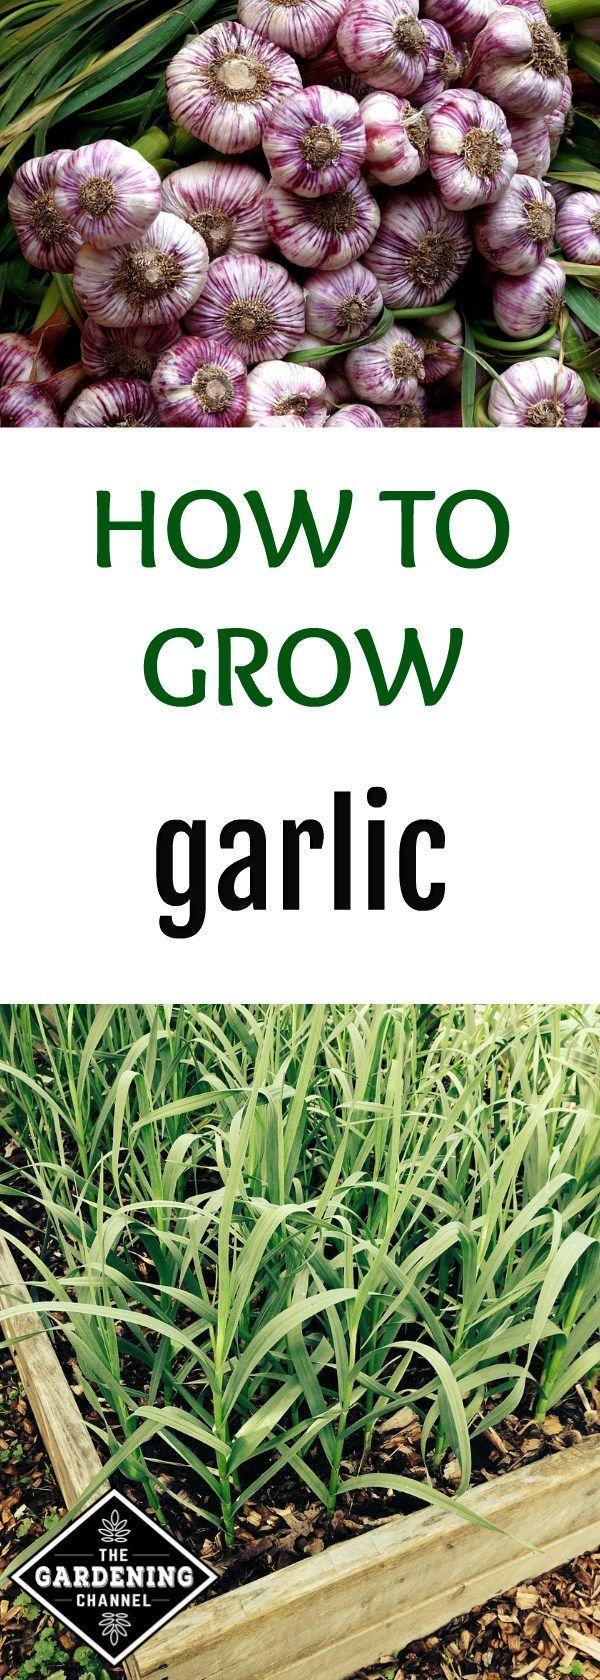 How to Grow Garlic – Allison Newman